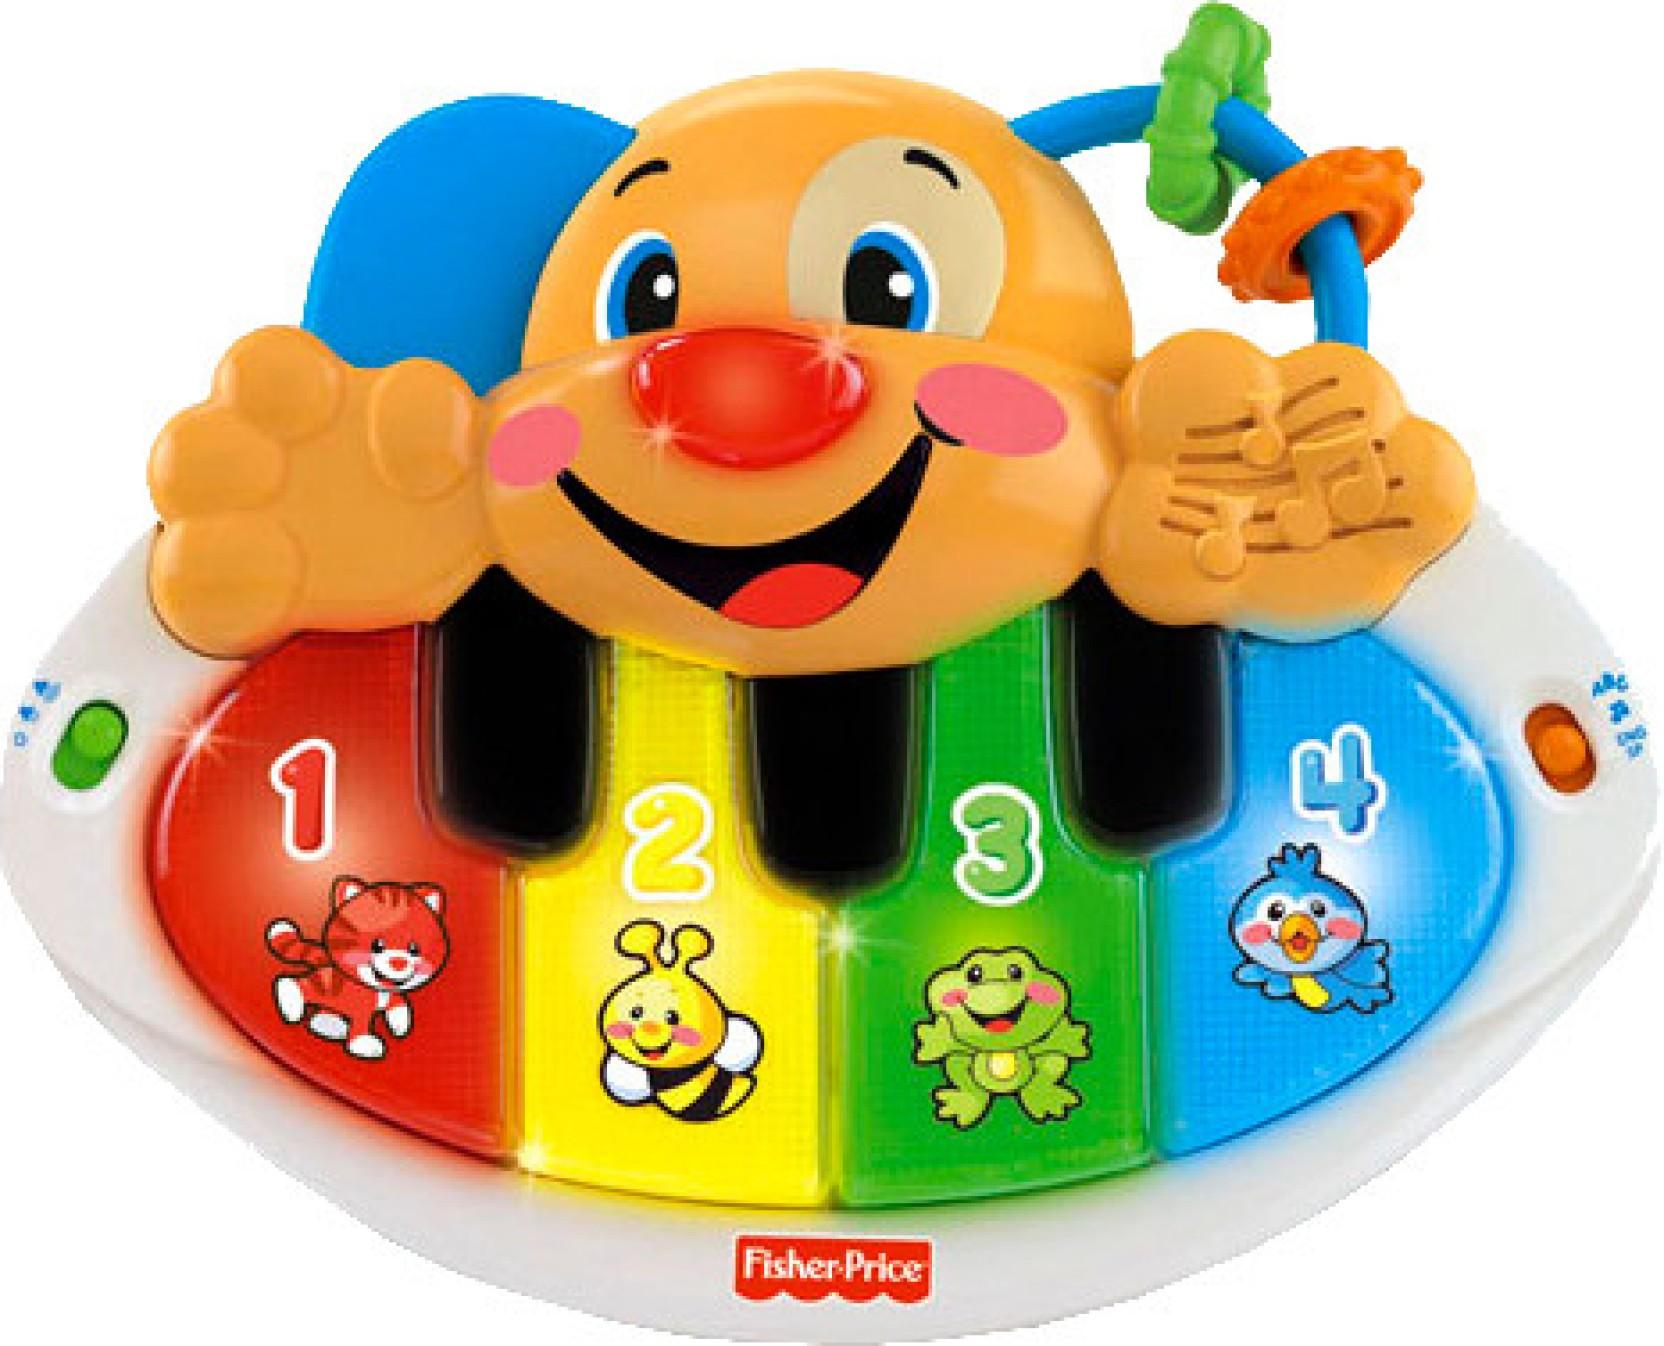 Childrens Laugh N Learn in Kenton | Childrens Laugh N ...